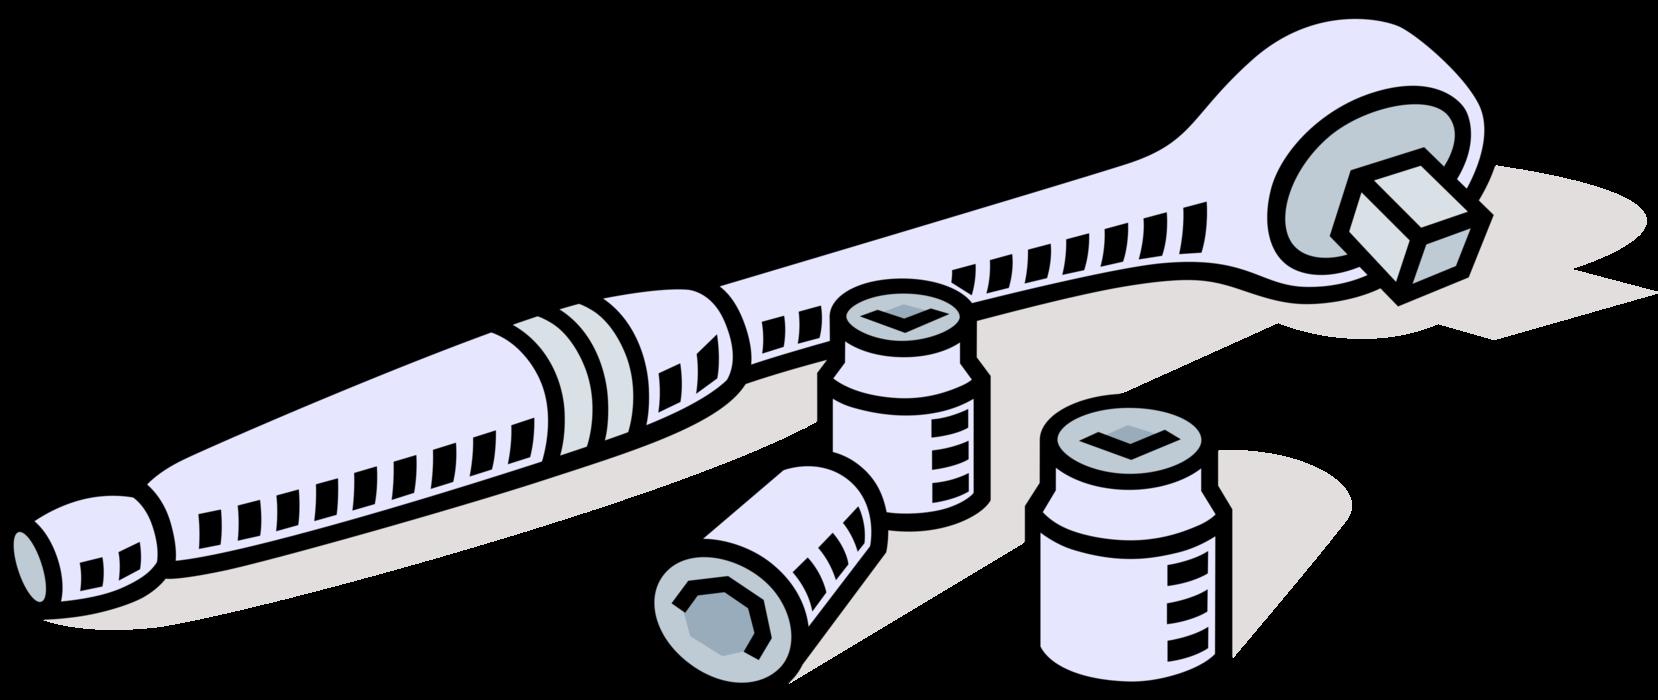 clipart stock Socket Wrench Ratchet